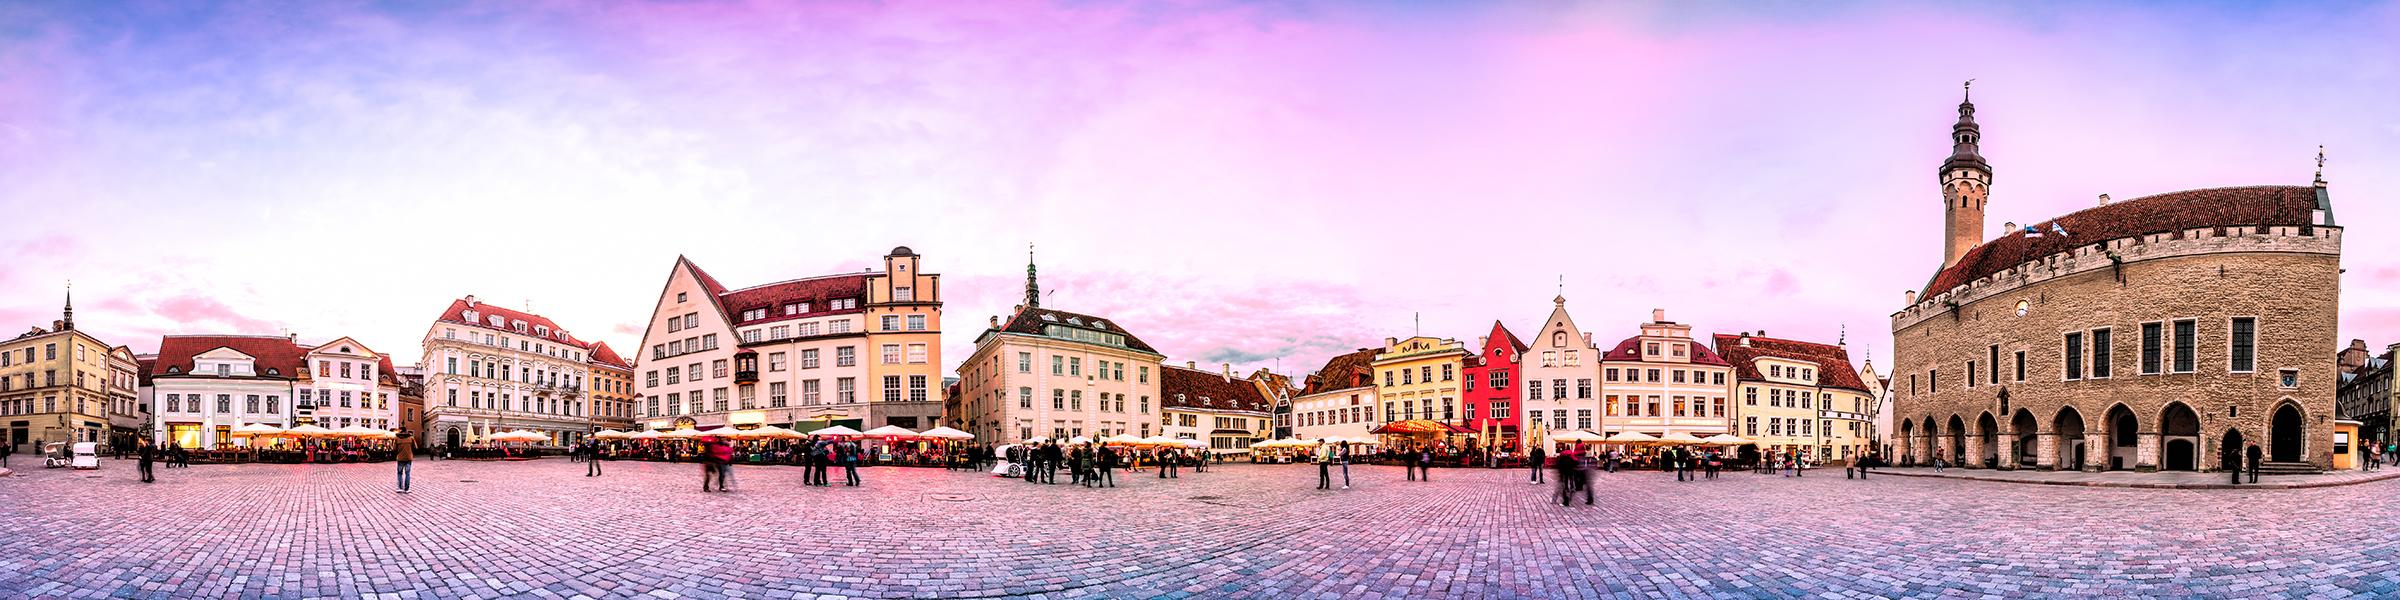 Estonia Tallinn Town Hall Square